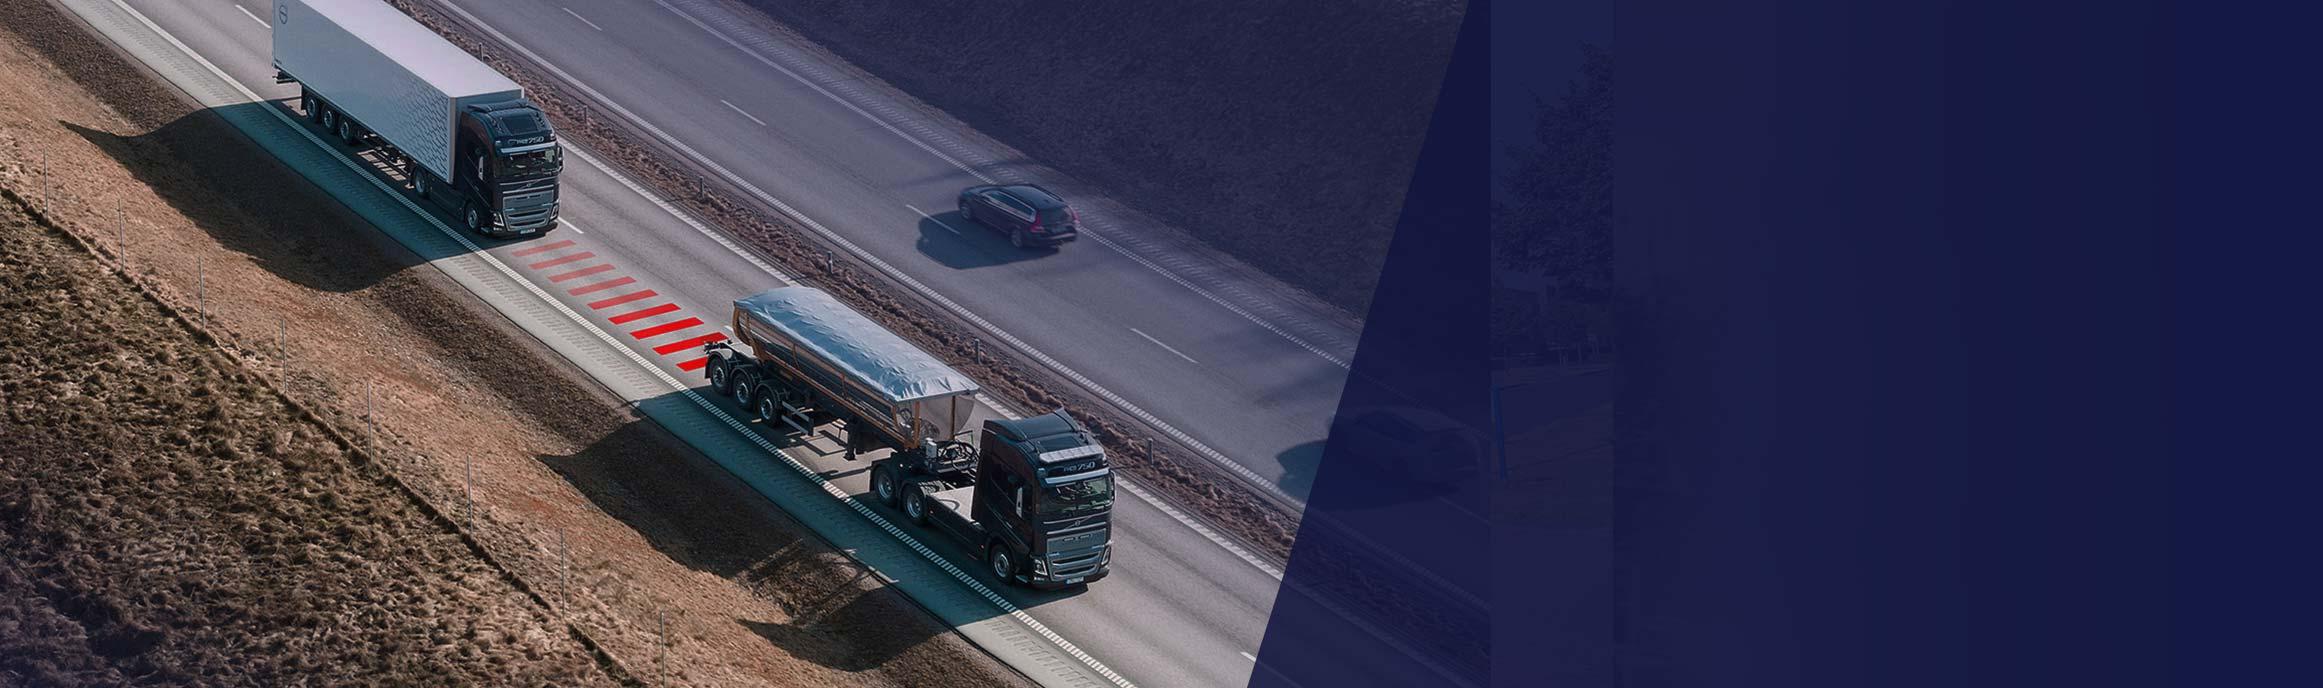 Veiligheidsoplossing Volvo trucks helpt afstand te houden